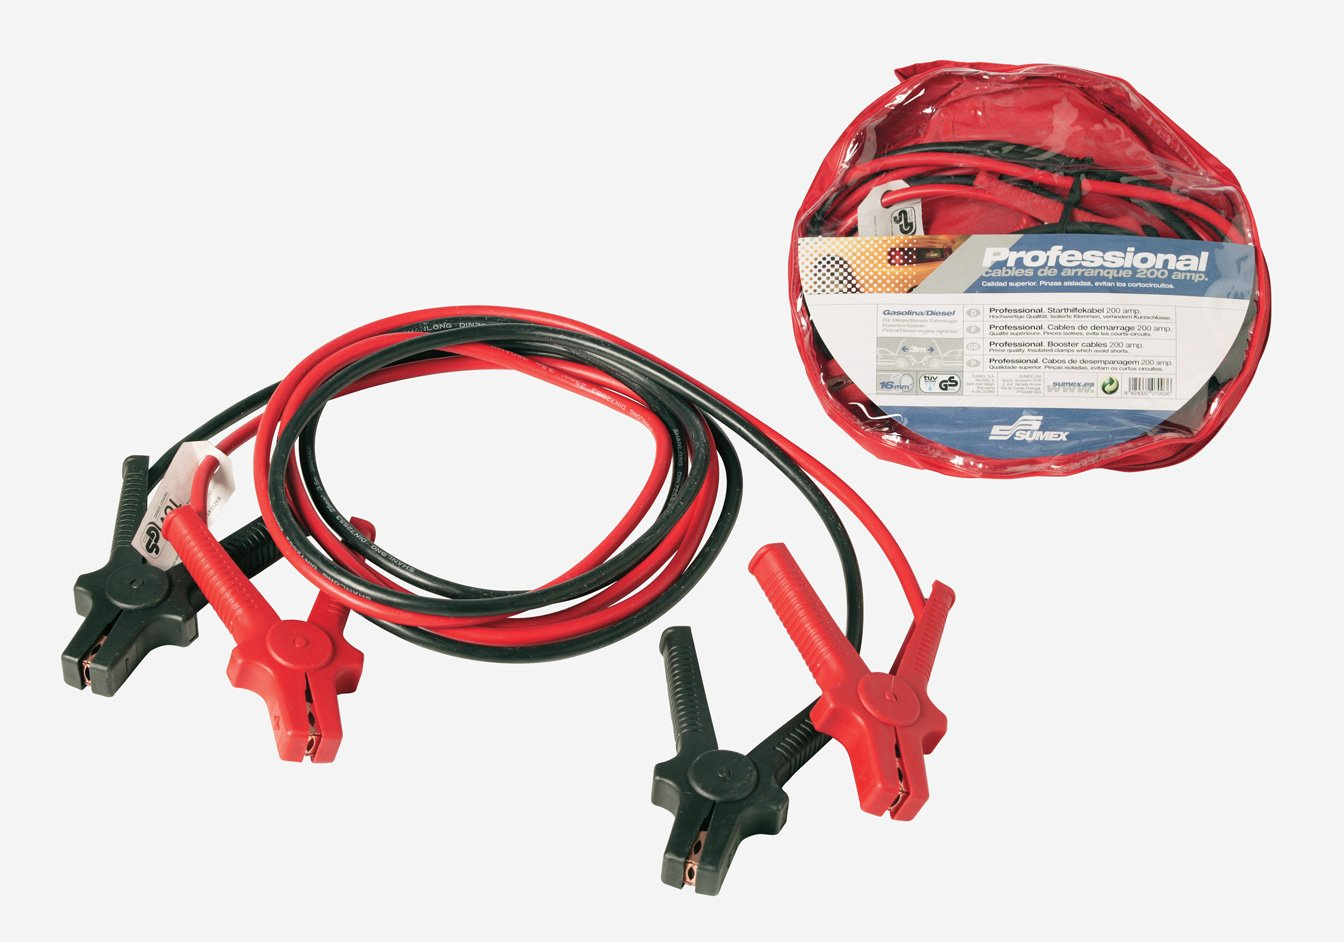 SUMEX 2707003 T/üv Cables Arranque Cobre 200 AMP 3 m 16 mm Gs